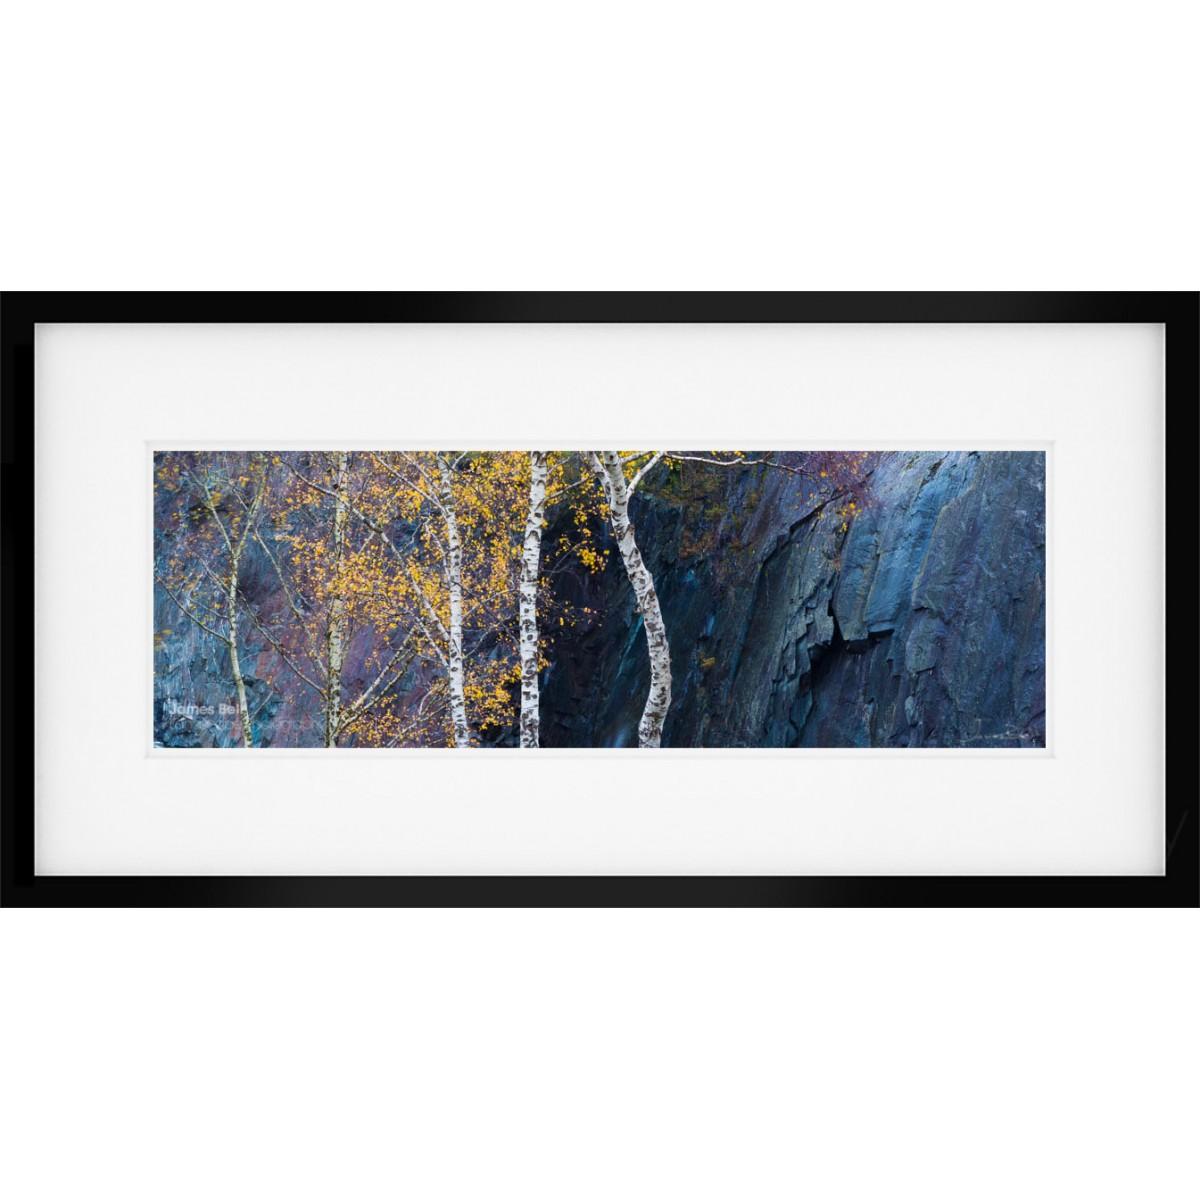 Silver Birch Contrast framed print